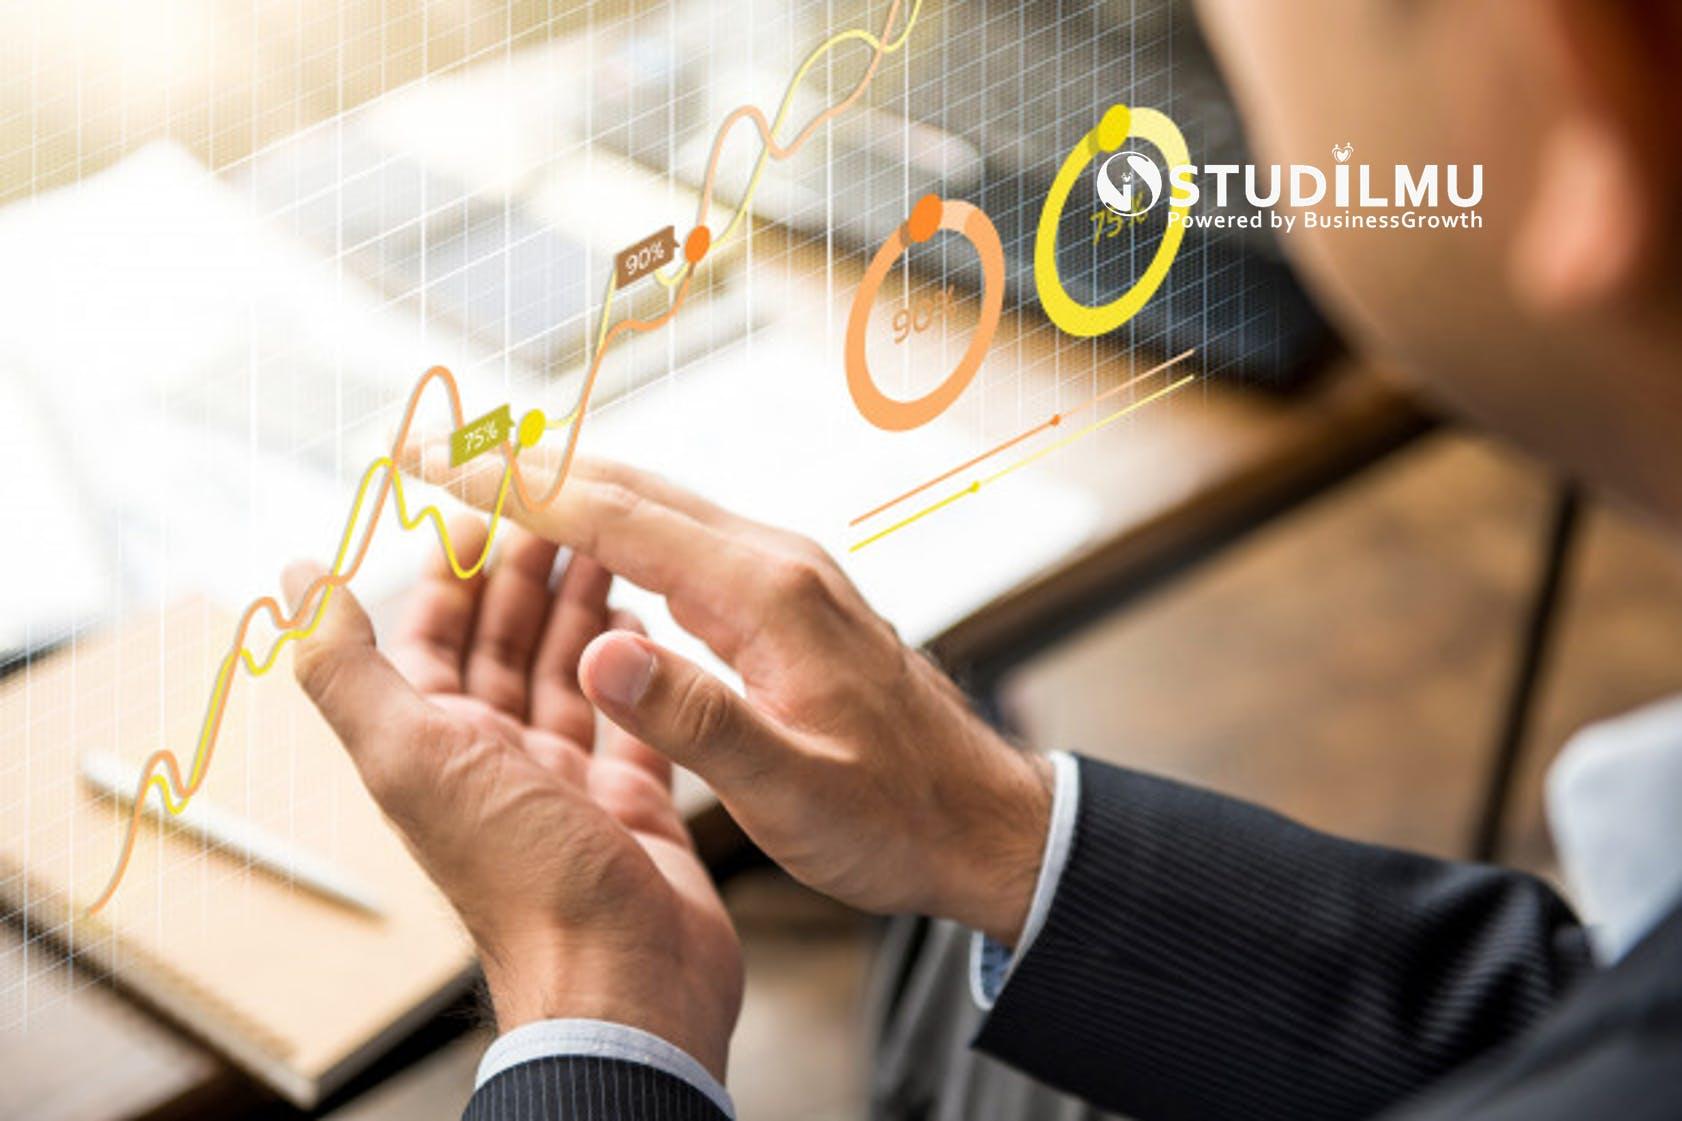 STUDILMU Career Advice - 4 Cara Sederhana untuk Meningkatkan Strategi Pemasaran Milenial